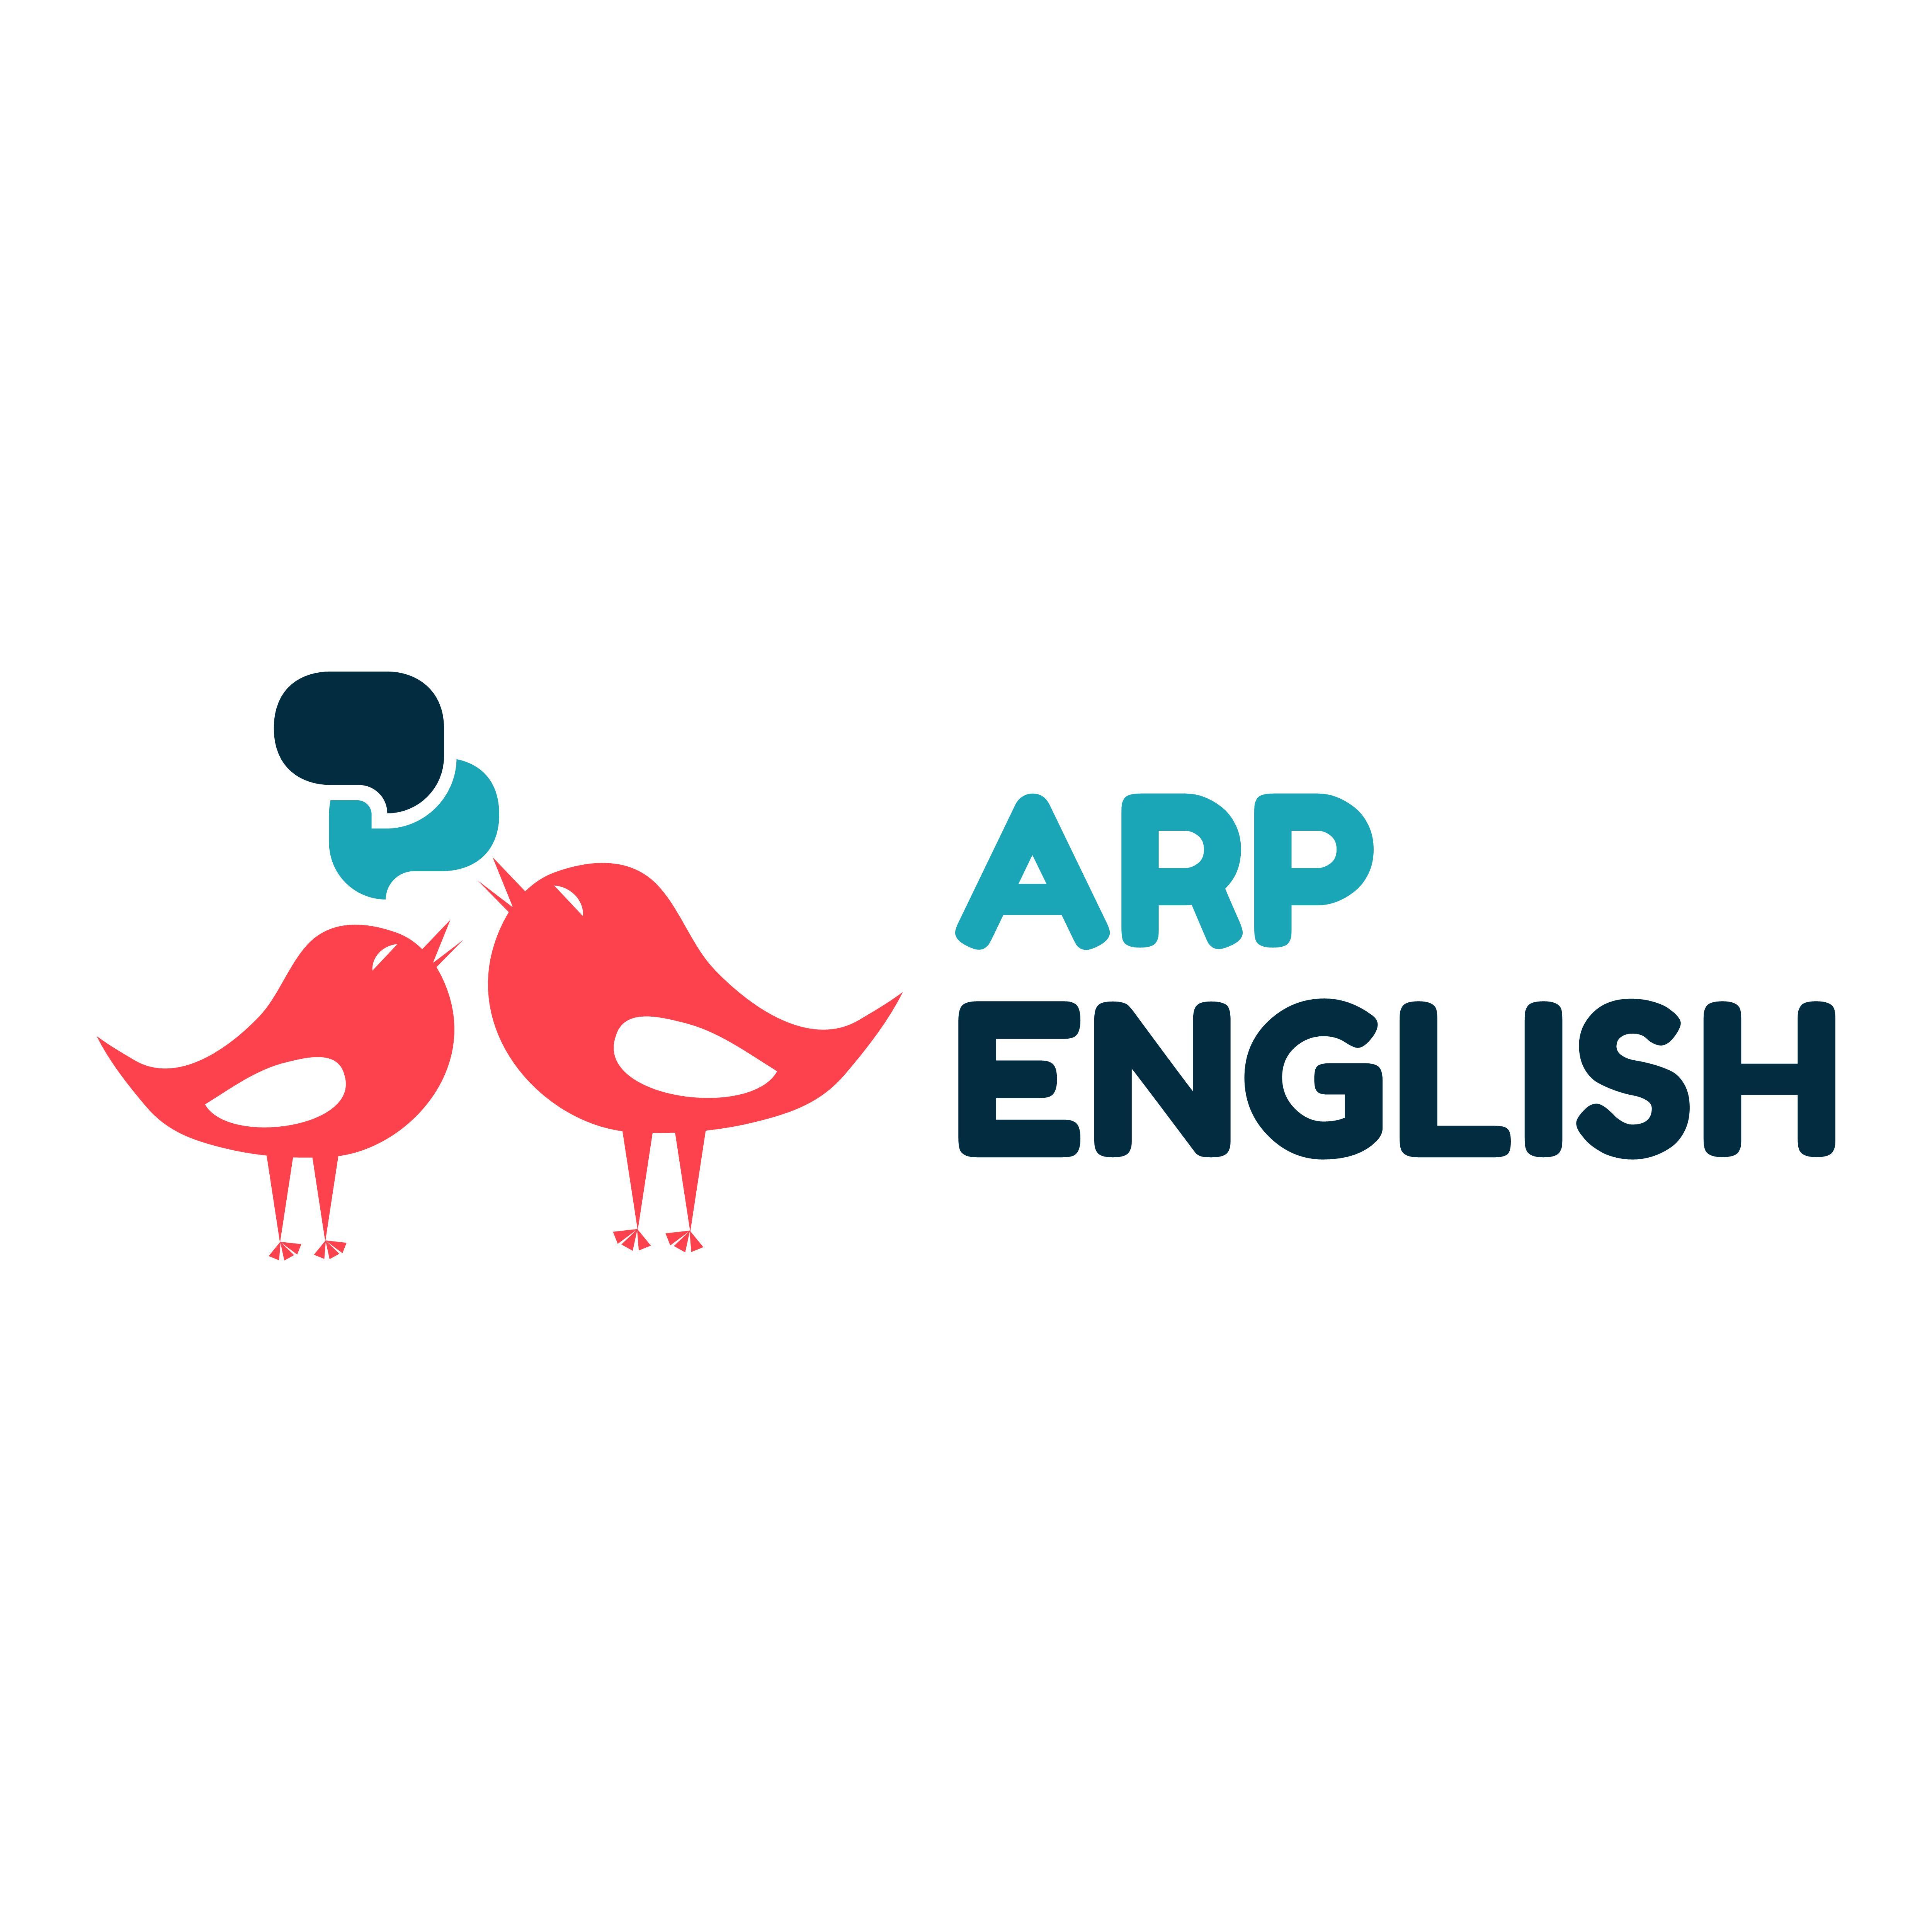 ARP English